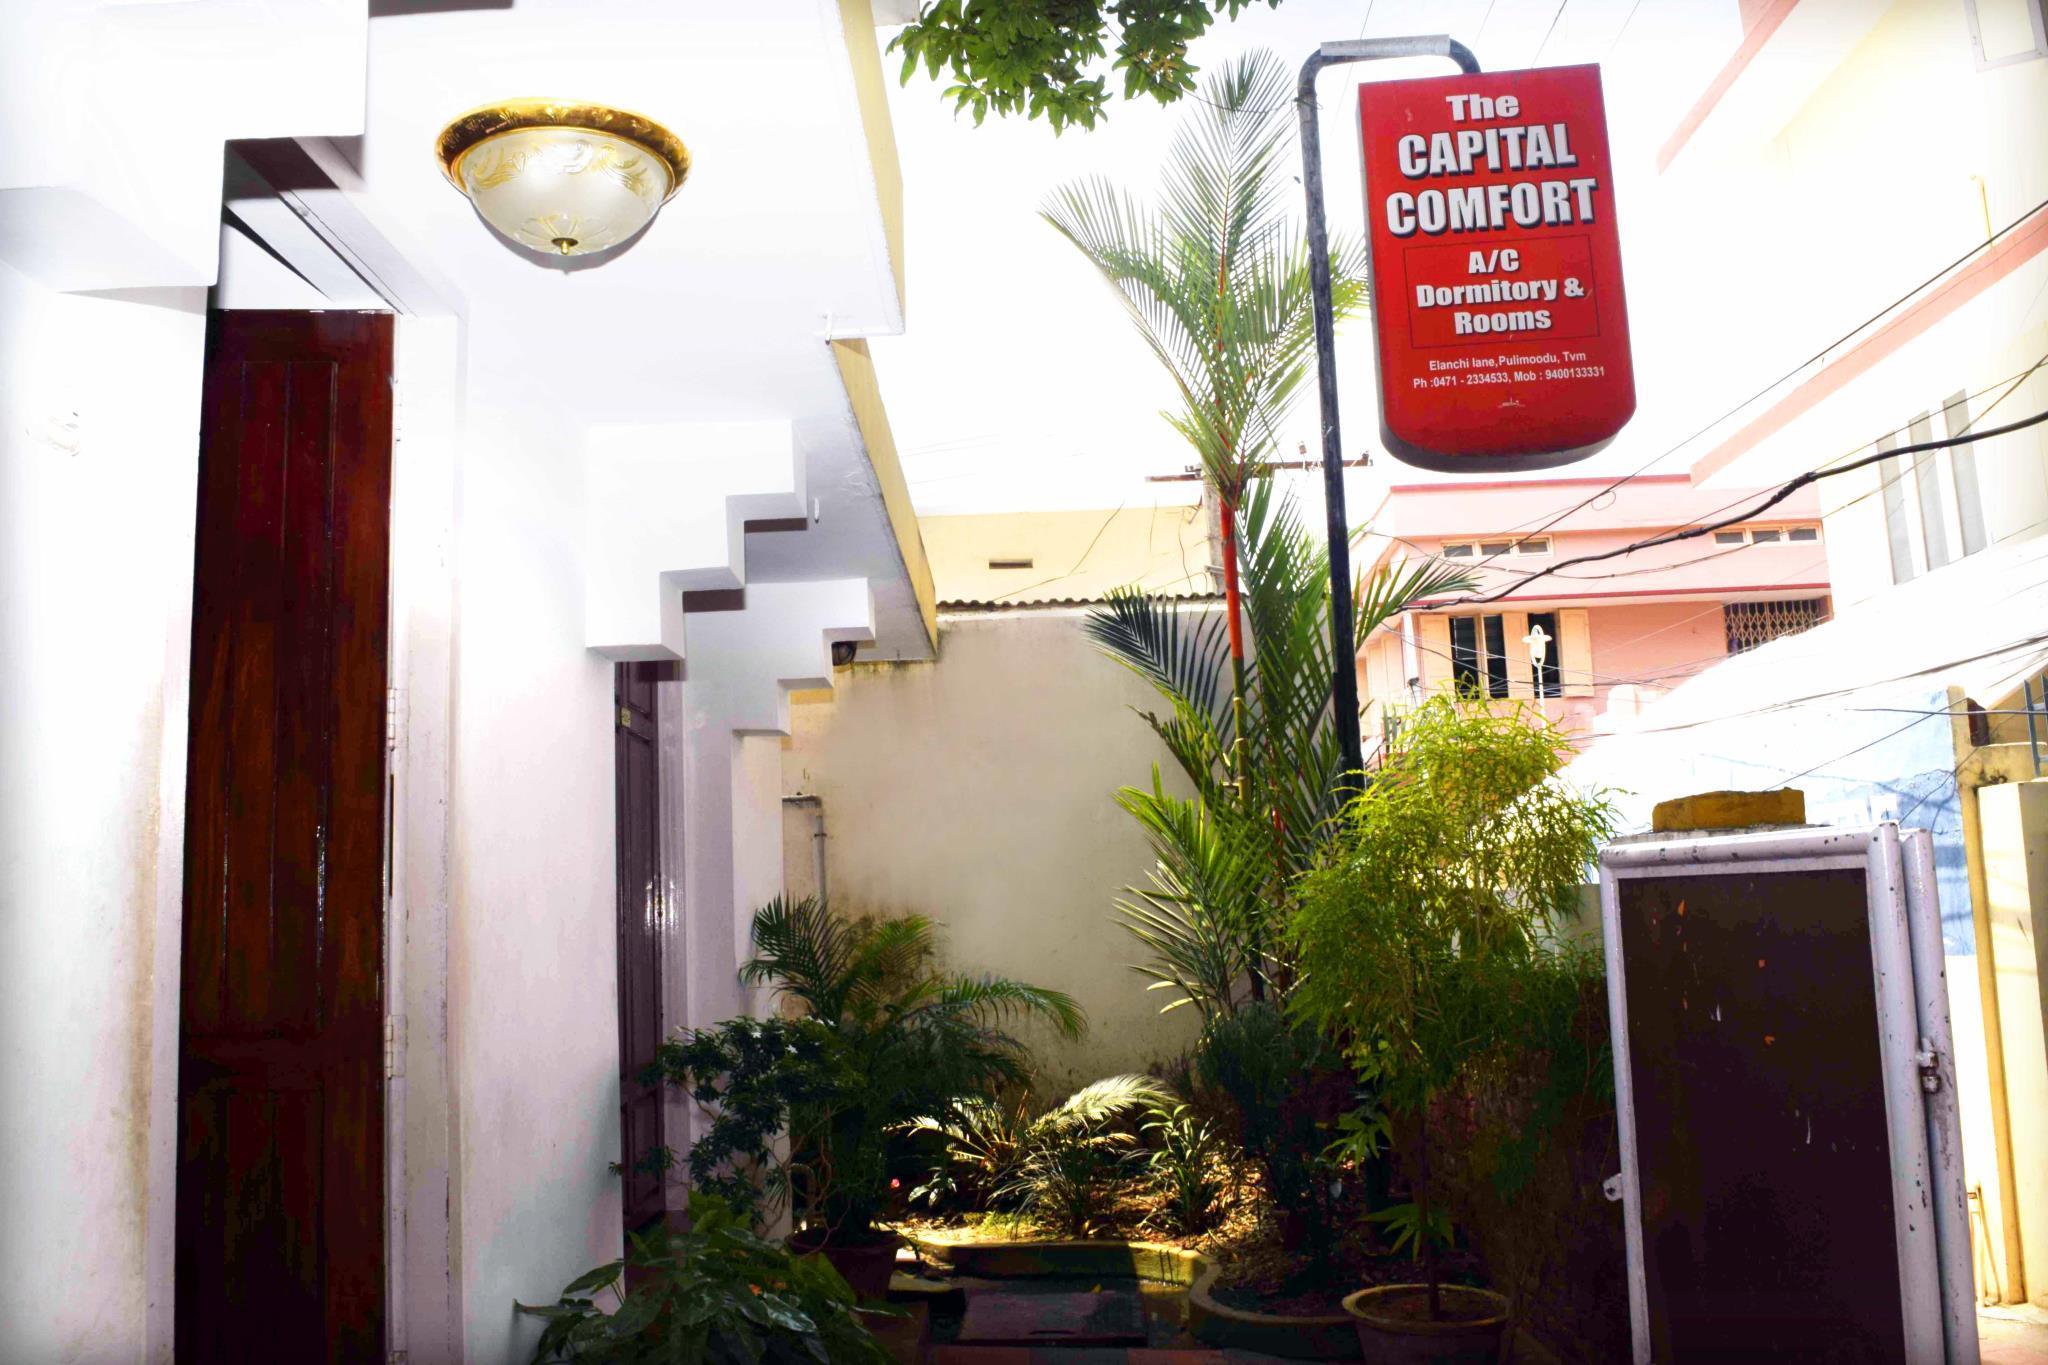 Capital Comfort